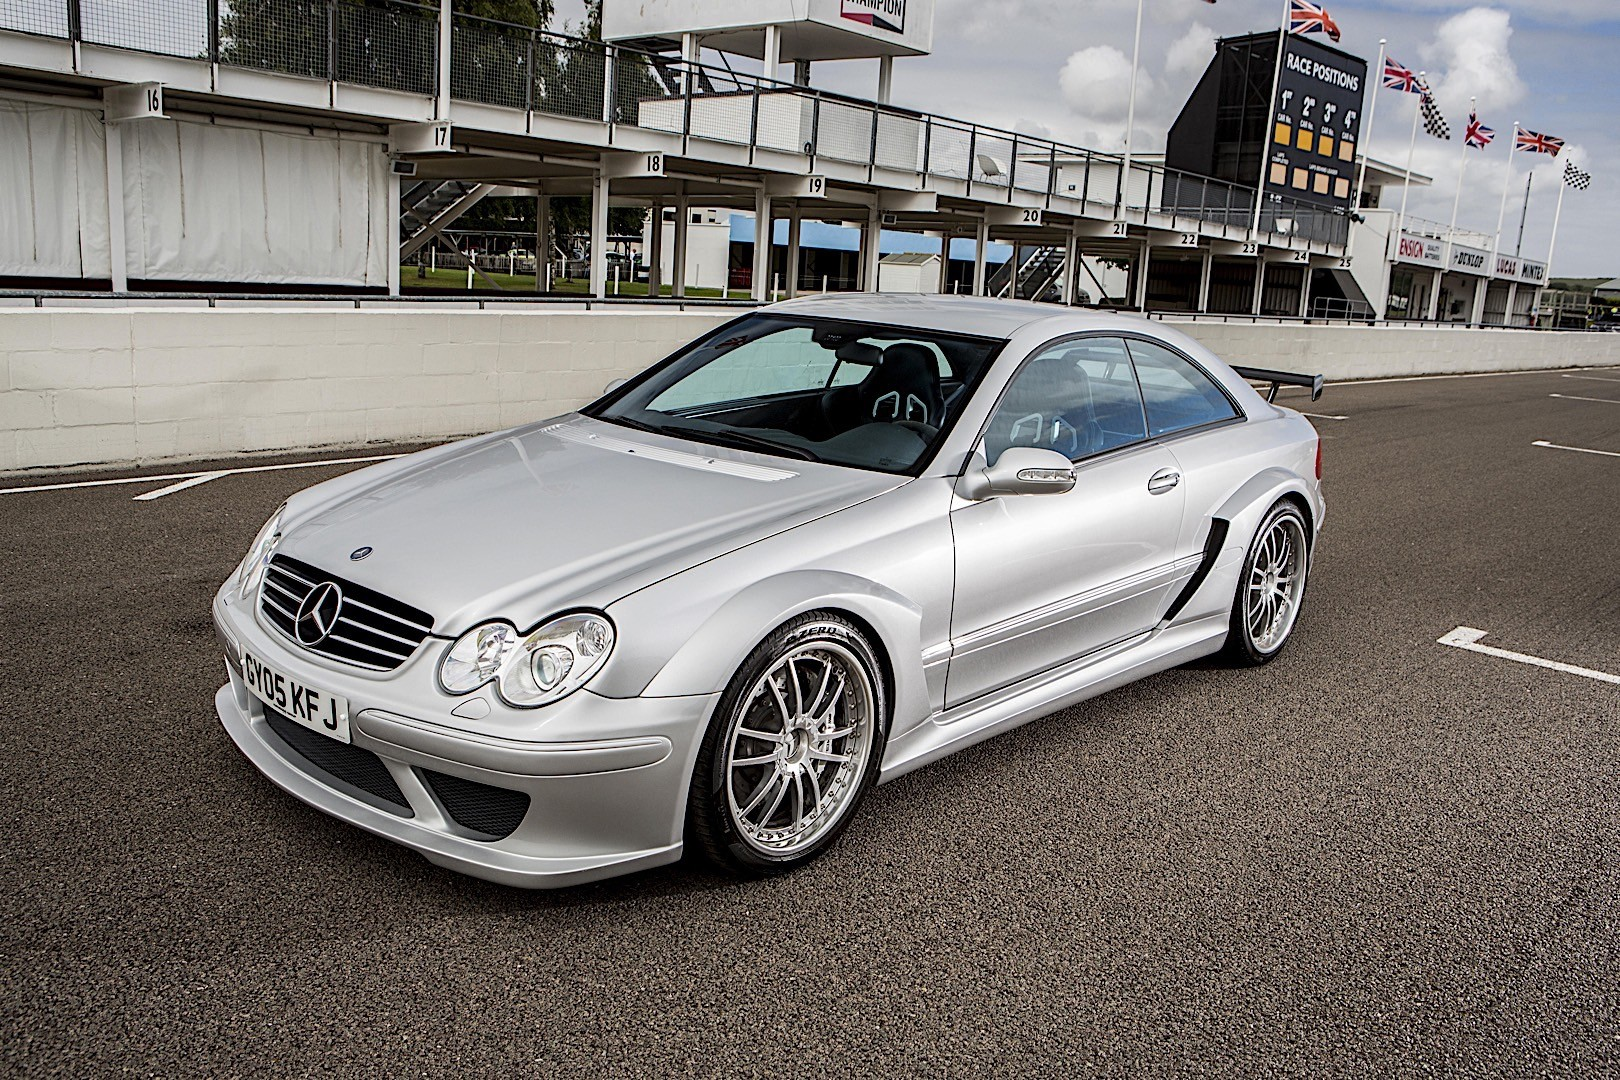 Mercedes benz clk dtm amg c209 specs 2004 autoevolution for Mercedes benz of tysons corner staff